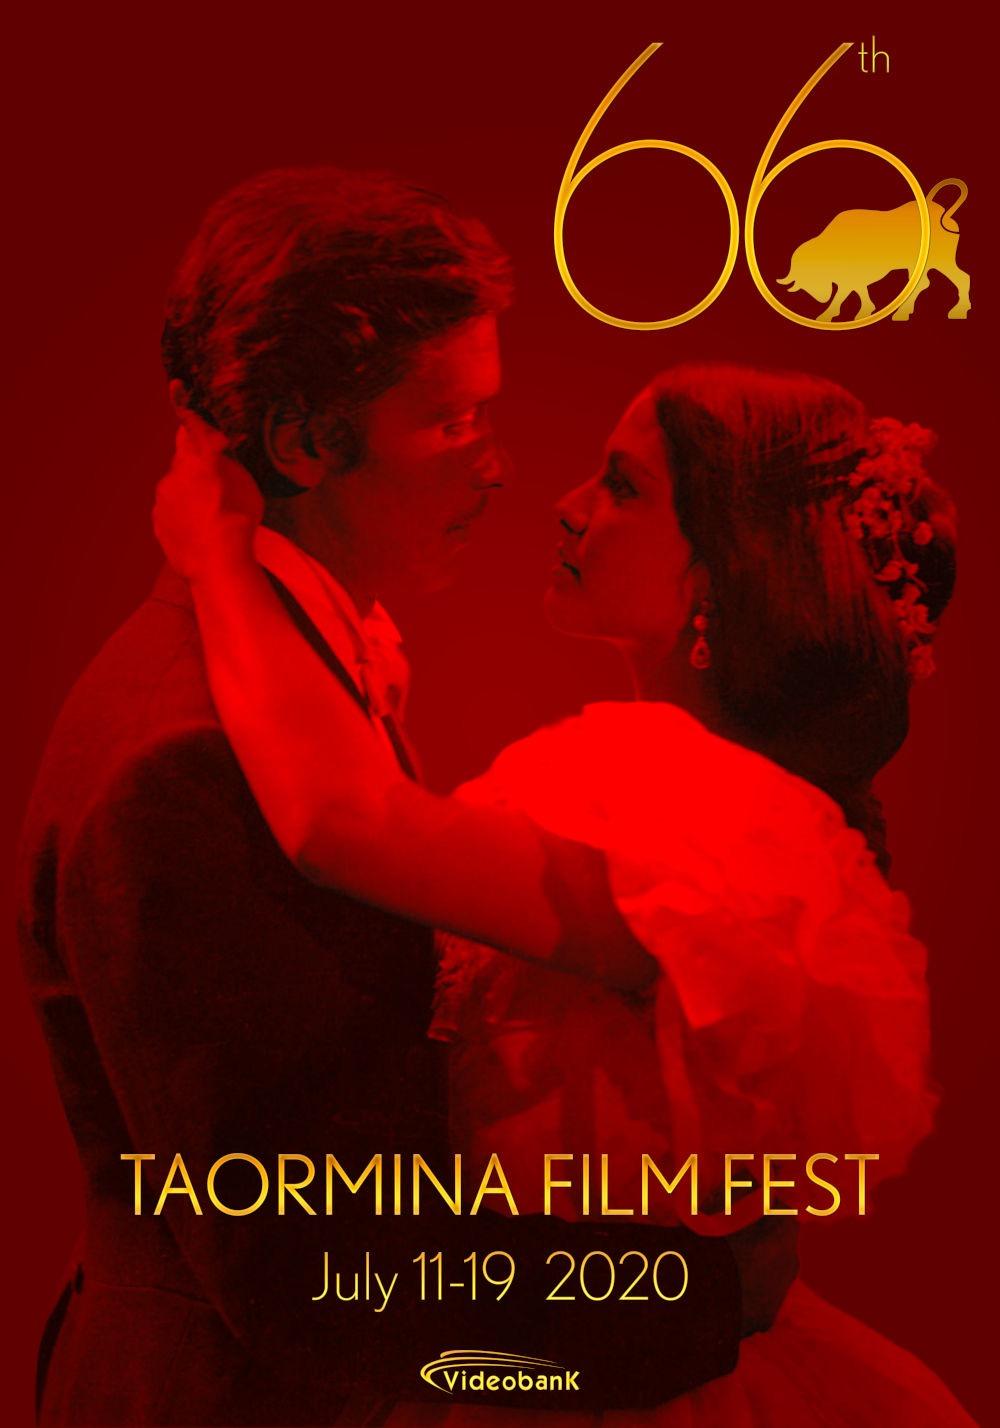 Taormina Film Fest 2020: Nikolaj Coster-Waldau (Jaime Lannister-GOT) tra gli ospiti dell'edizione 2020